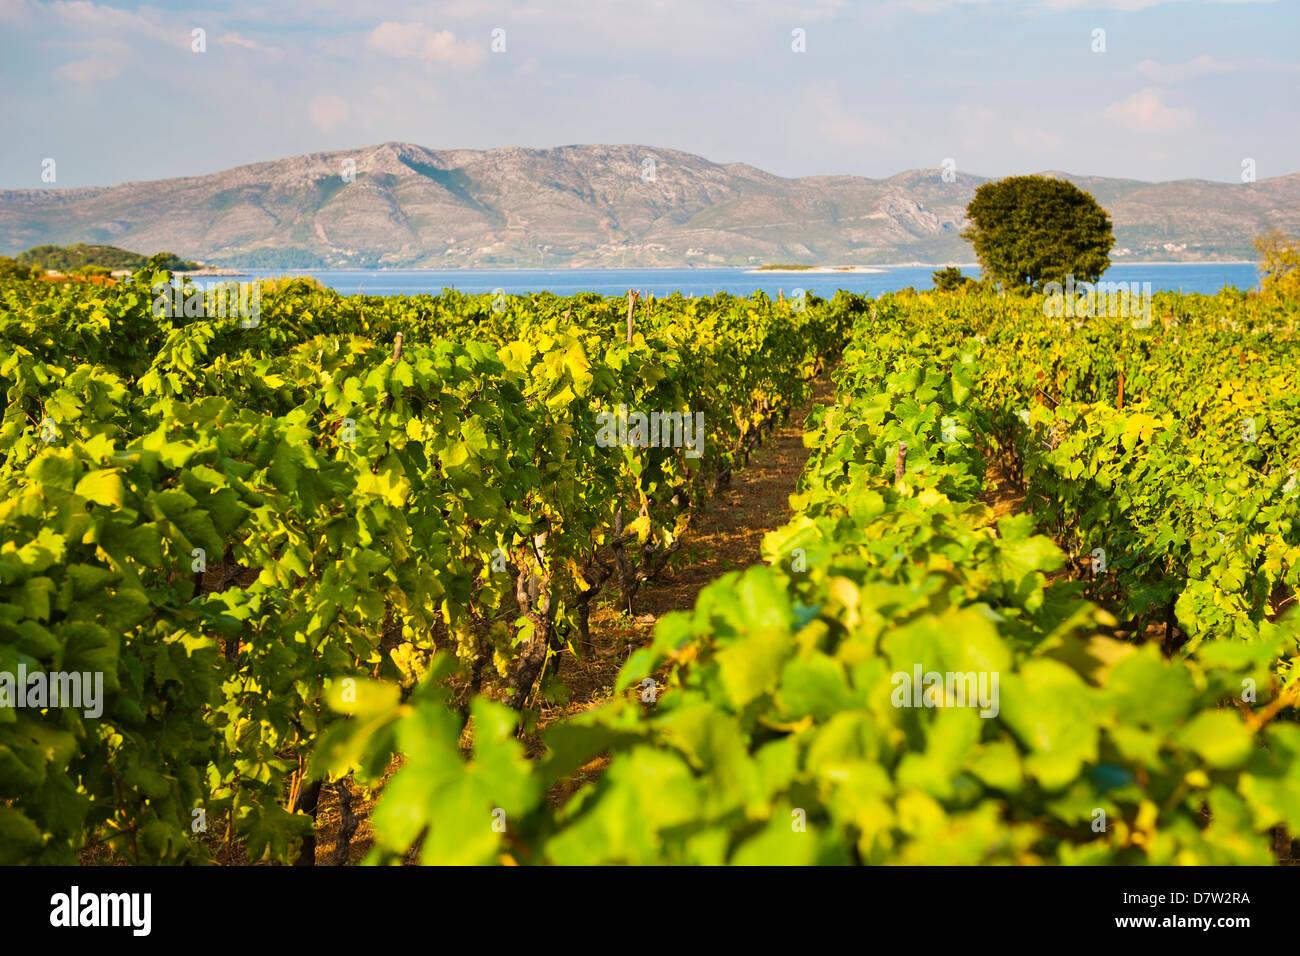 Vineyard, Lumbarda, Korcula Island, Dalmatian Coast, Adriatic, Croatia - Stock Image